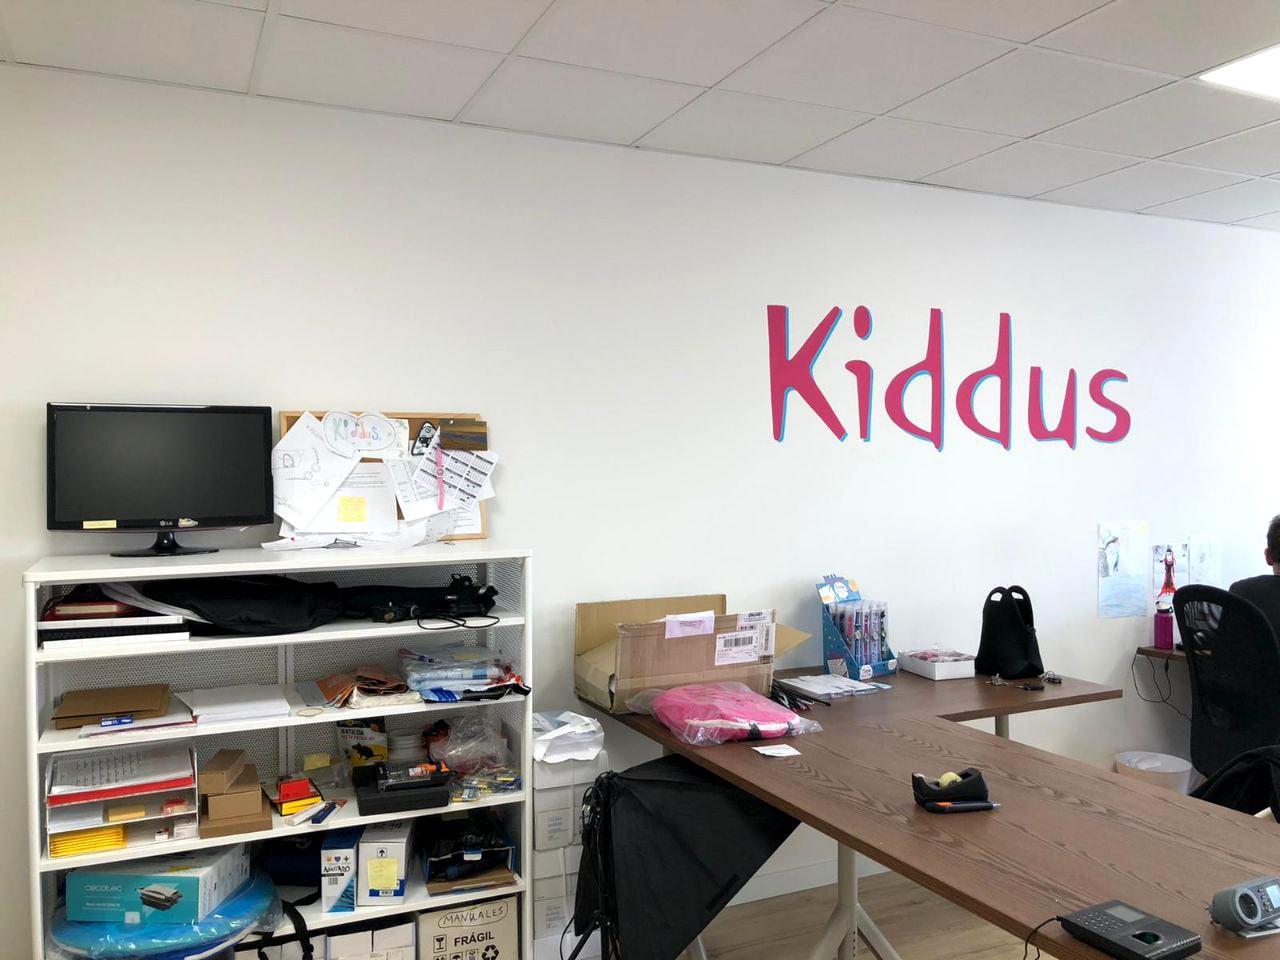 Pintura Mural en oficina de Kiddus